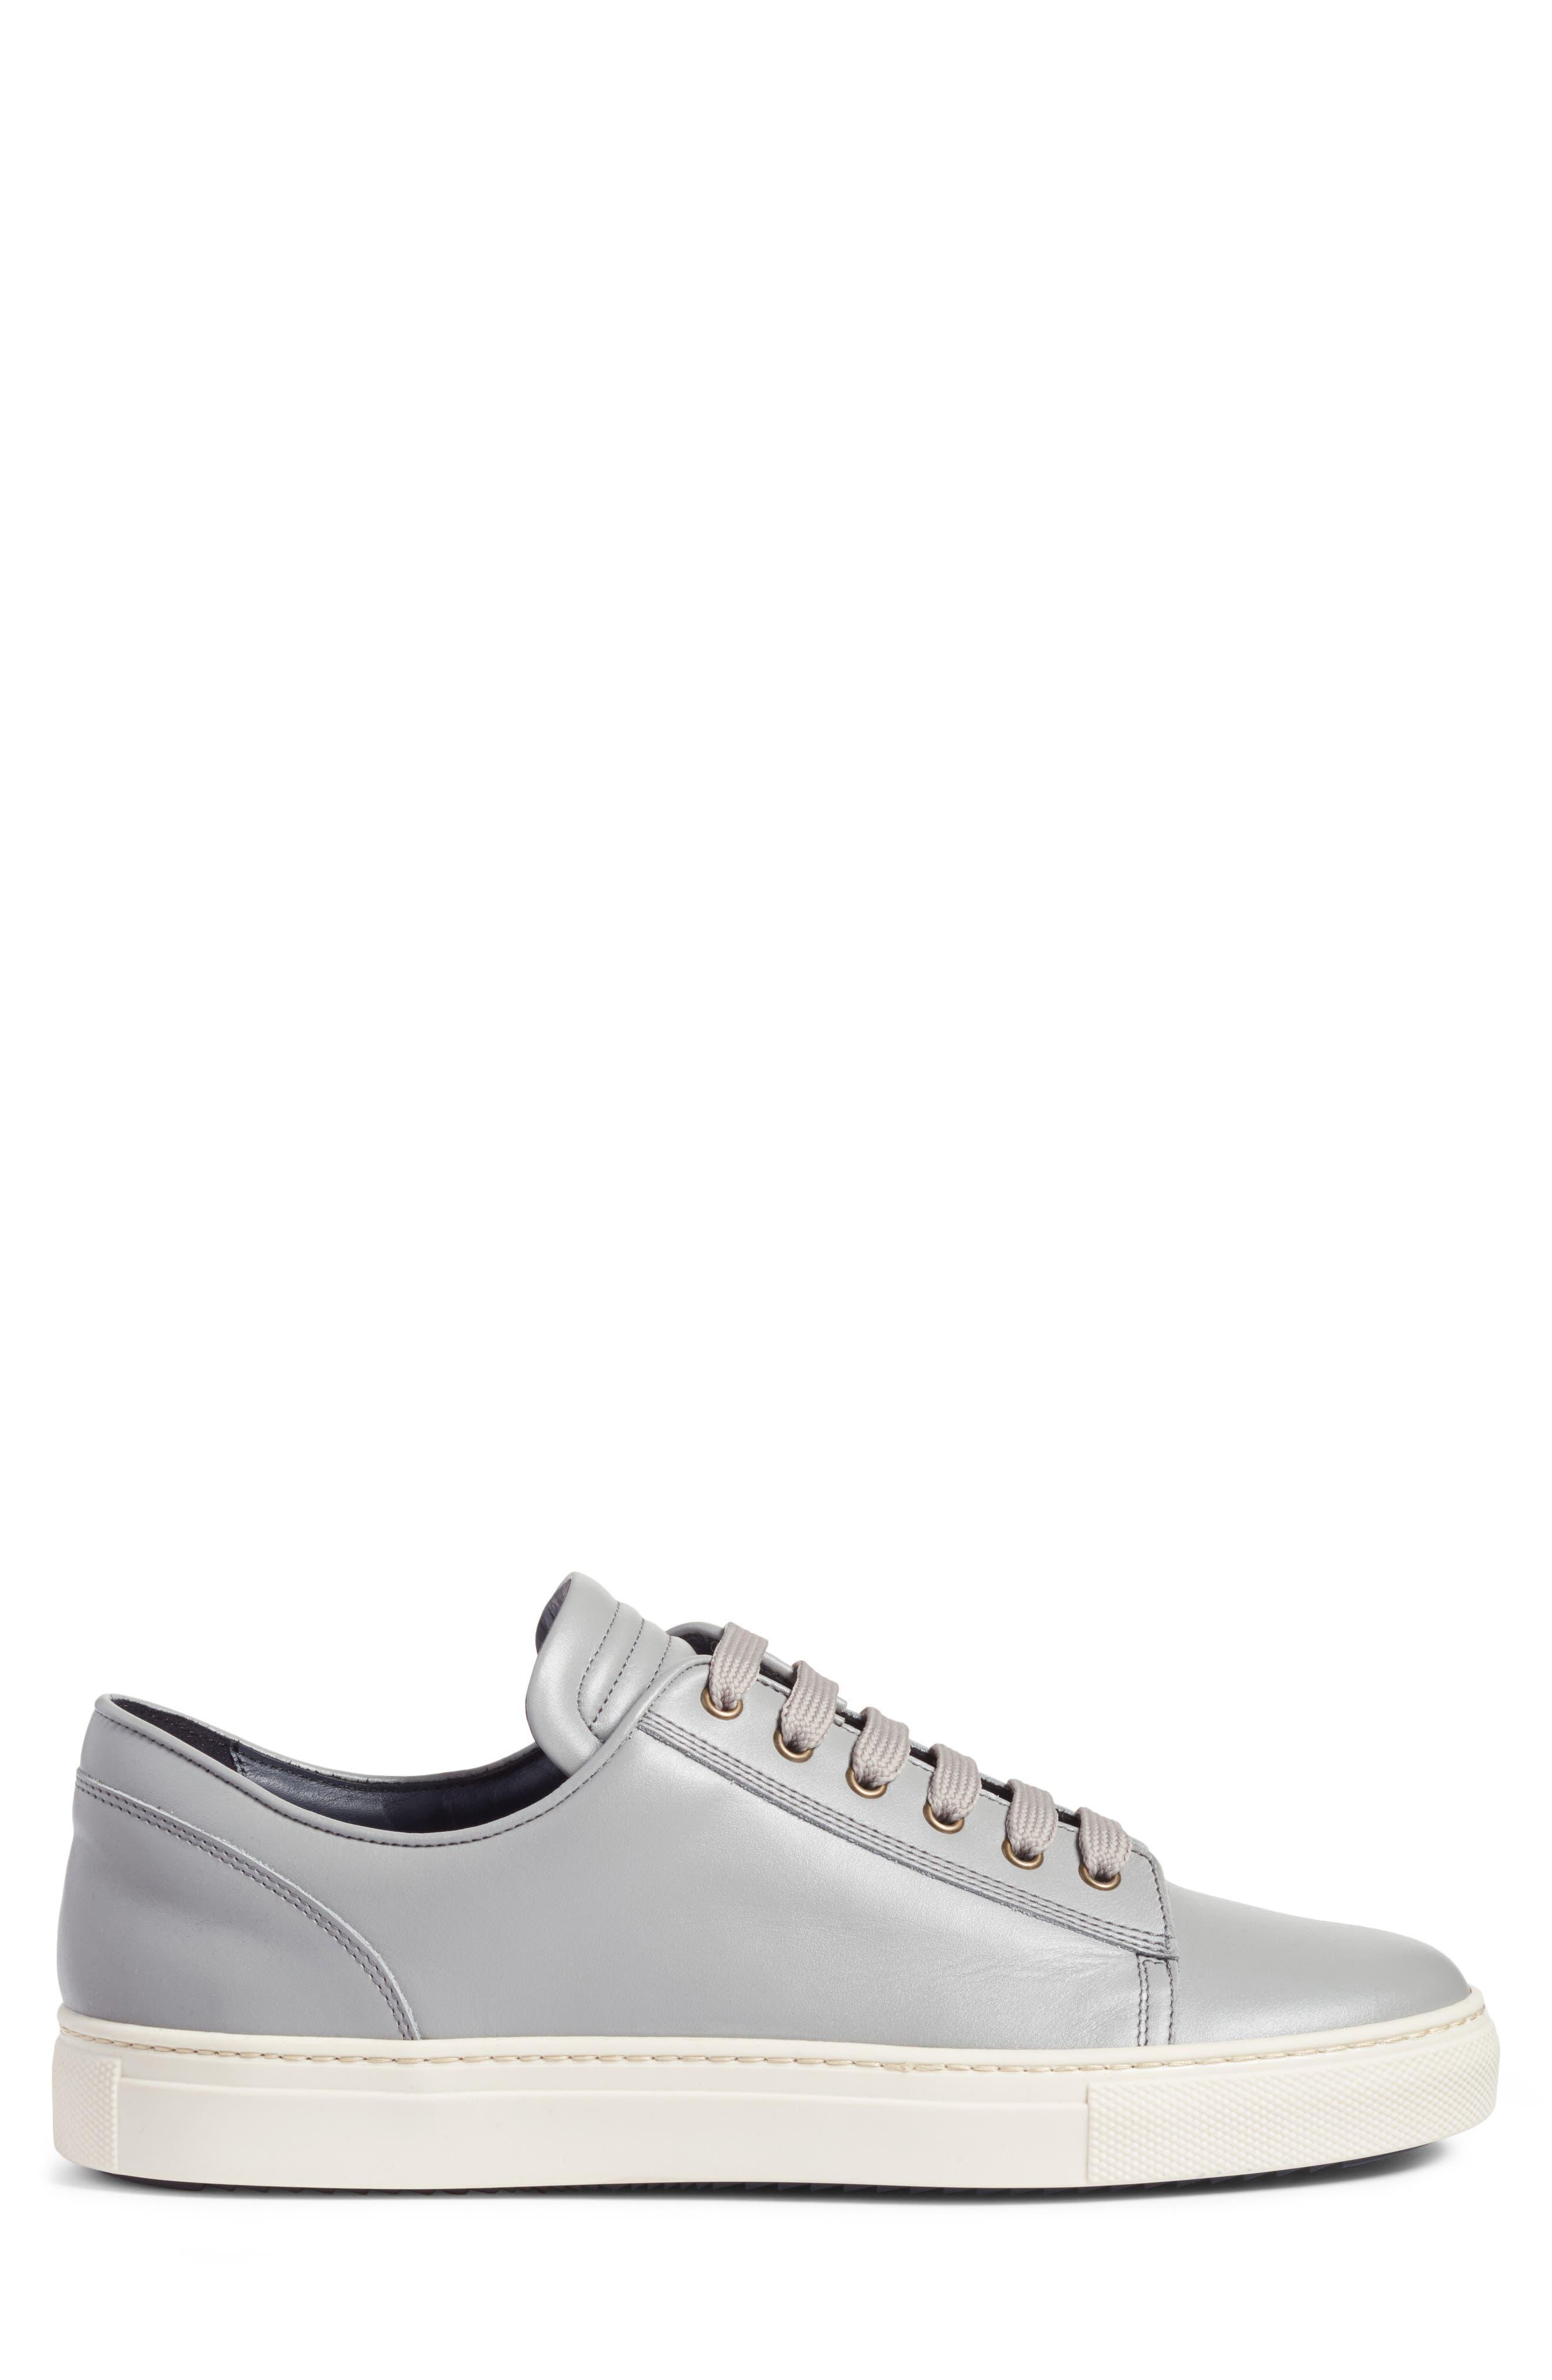 Taranto Sneaker,                             Alternate thumbnail 3, color,                             020